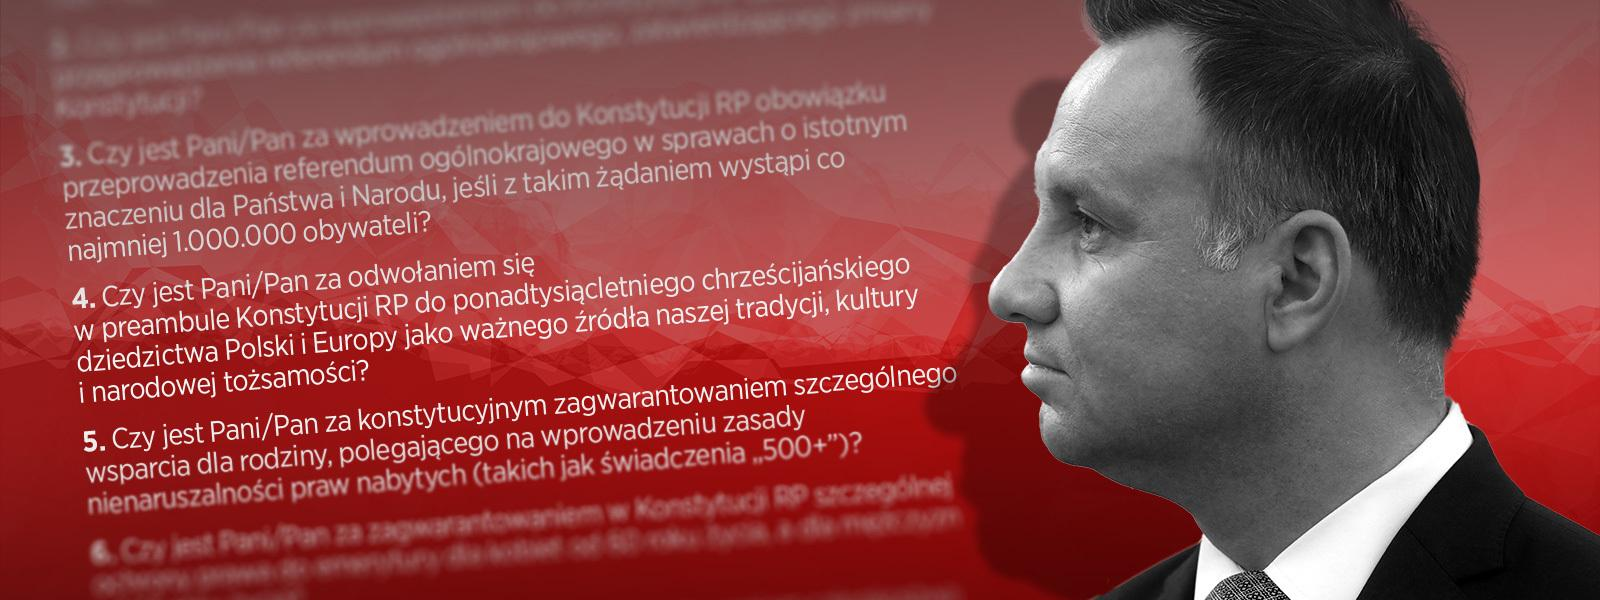 Andrzej Duda konstytucja RP referendum konstytucyjne